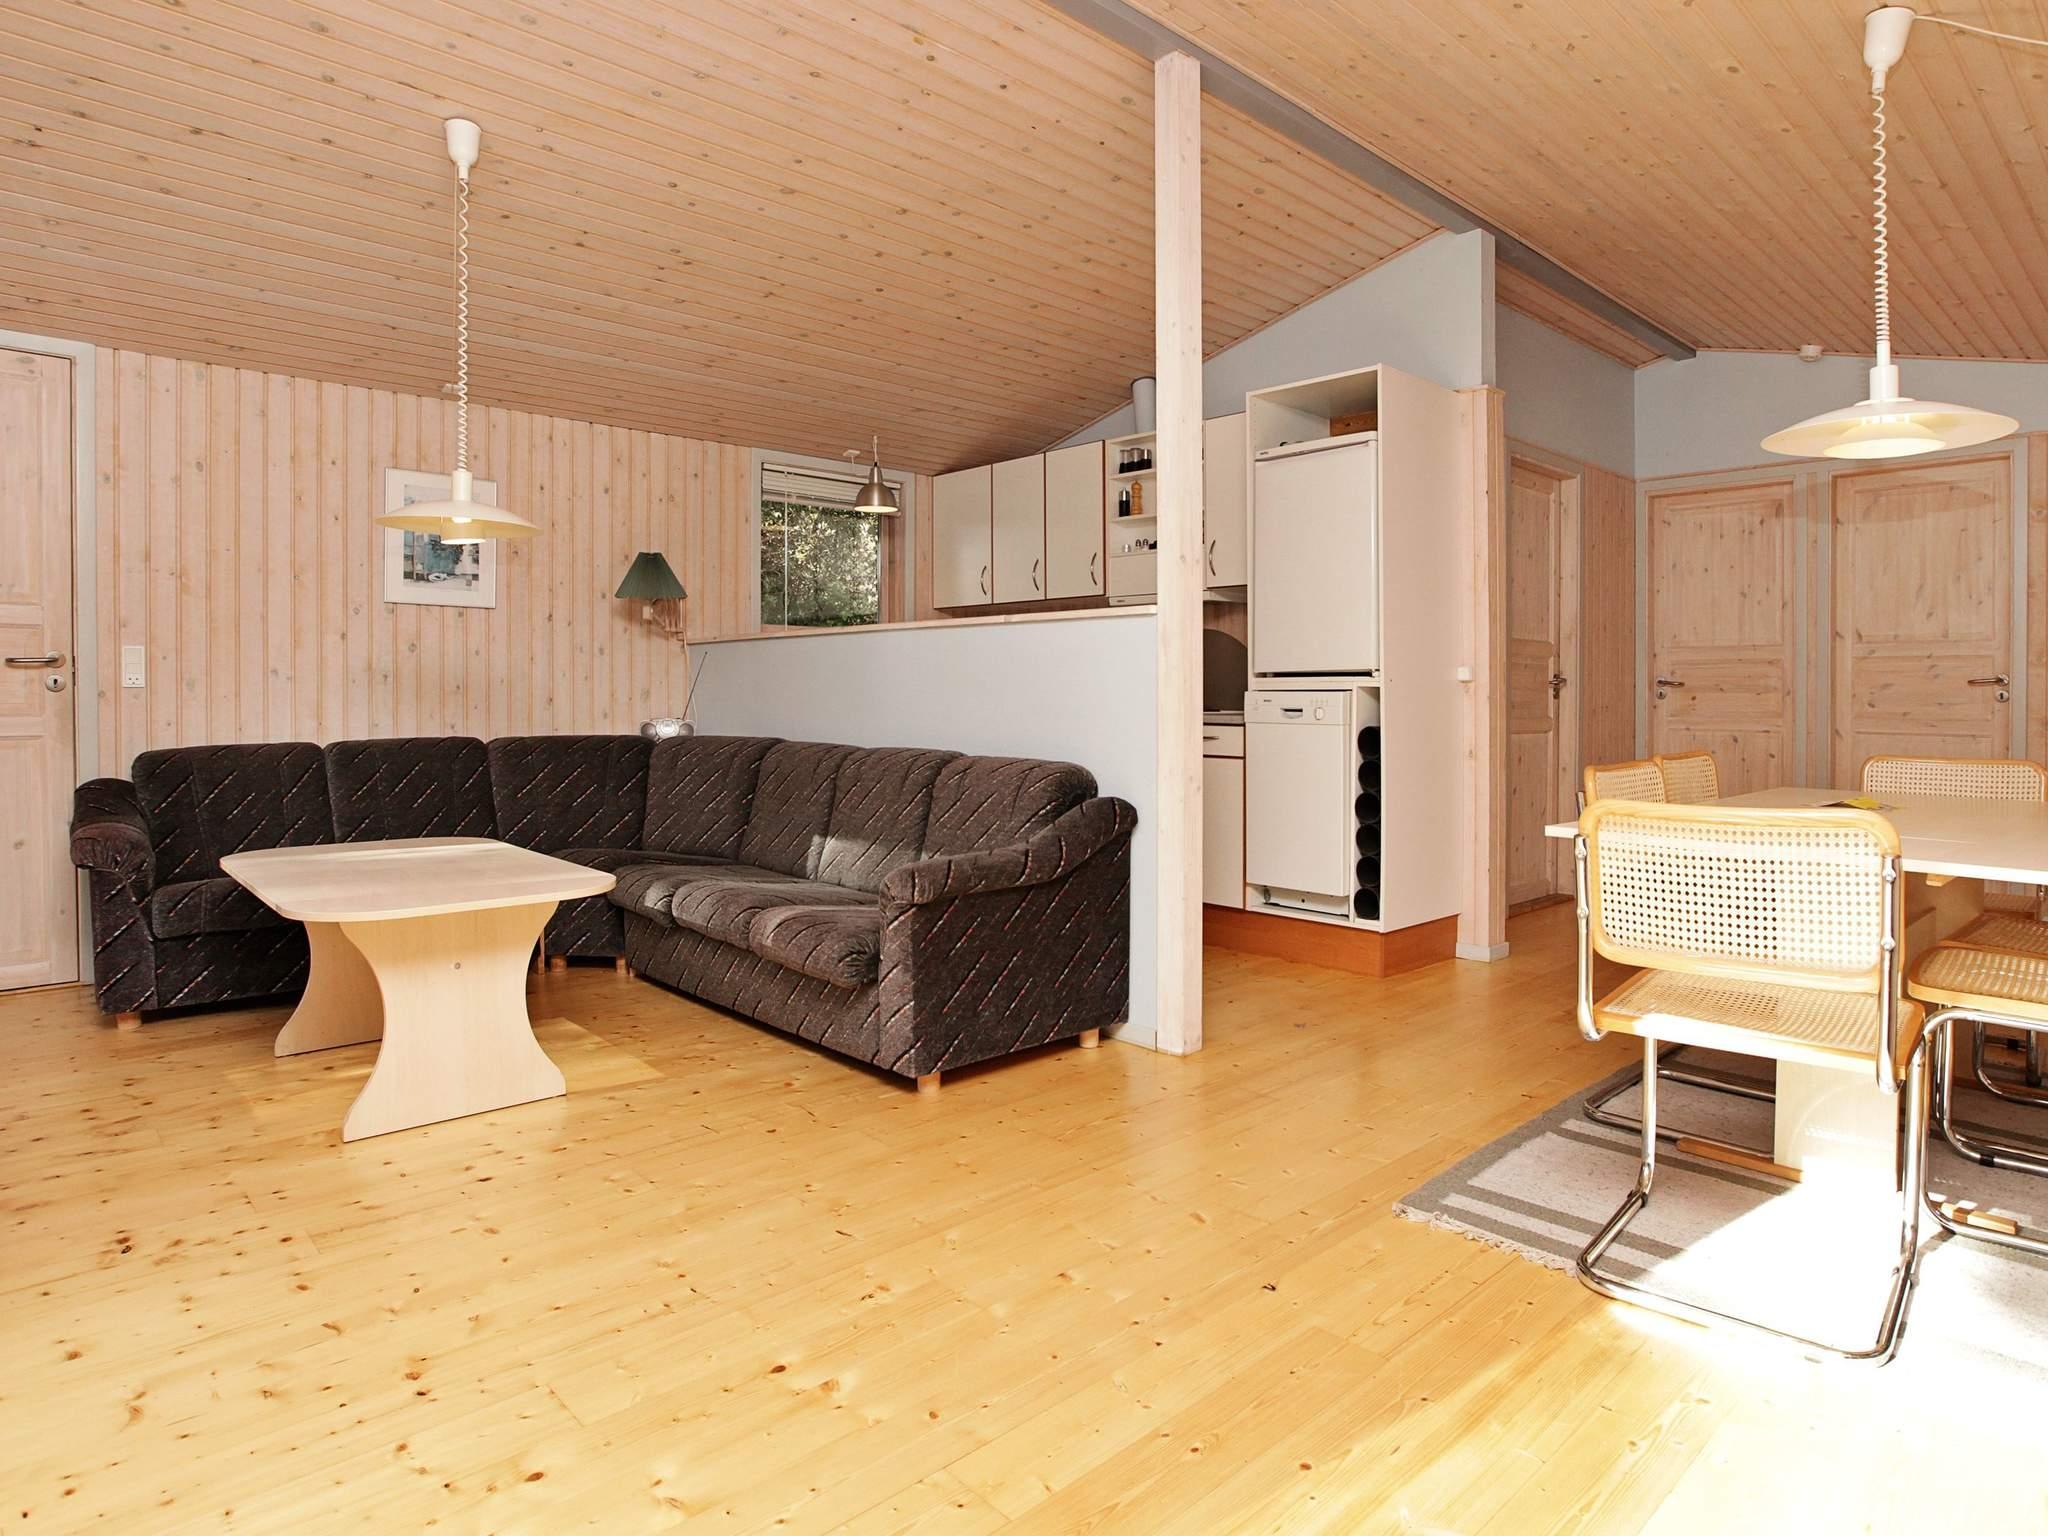 Ferienhaus Overby Lyng (93505), Nykøbing Sj, , Westseeland, Dänemark, Bild 8